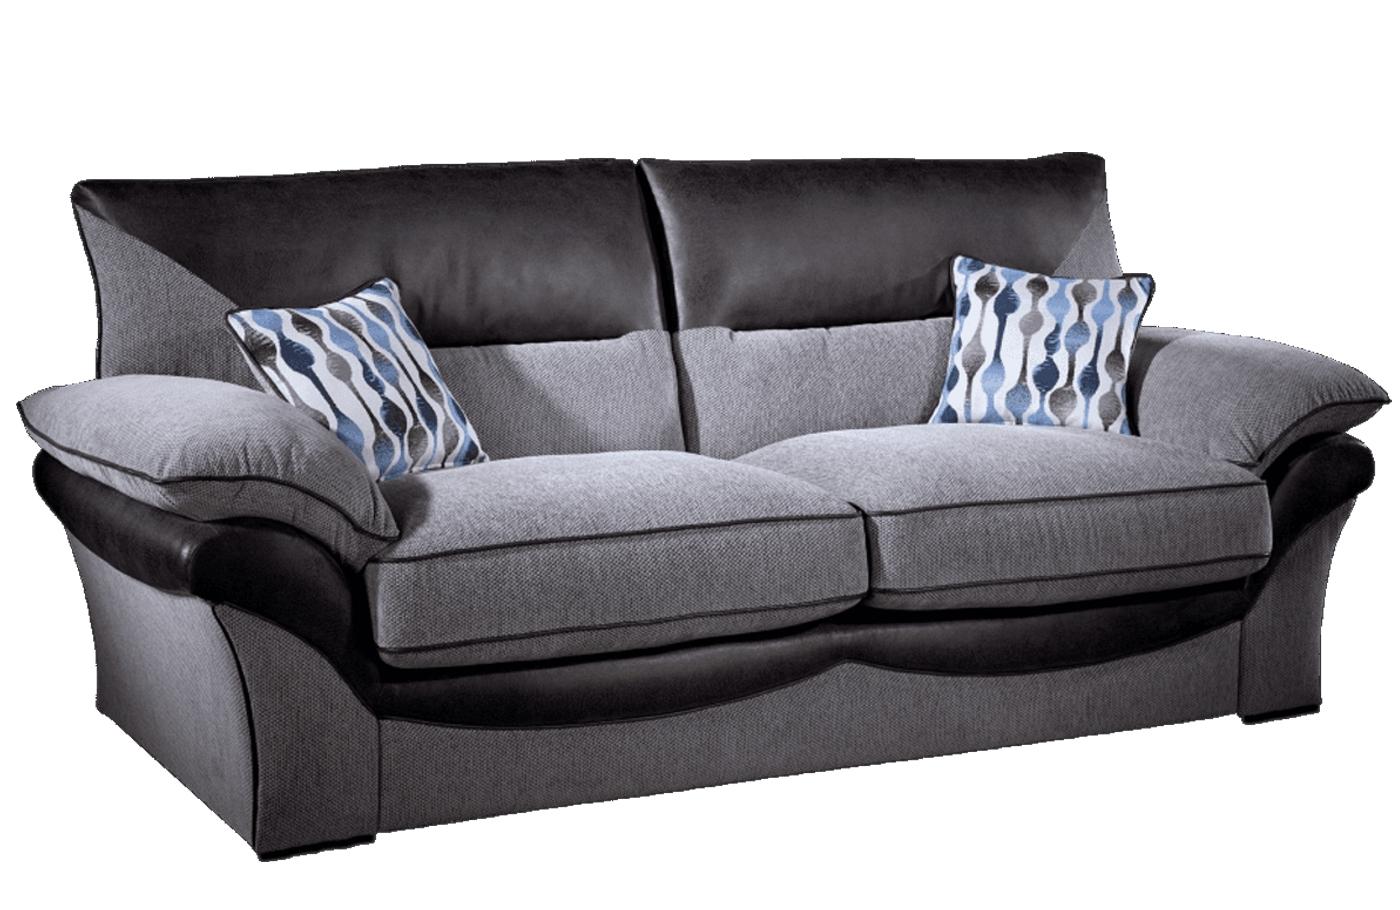 Lebus Chloe 3 Seater Fabric Sofa